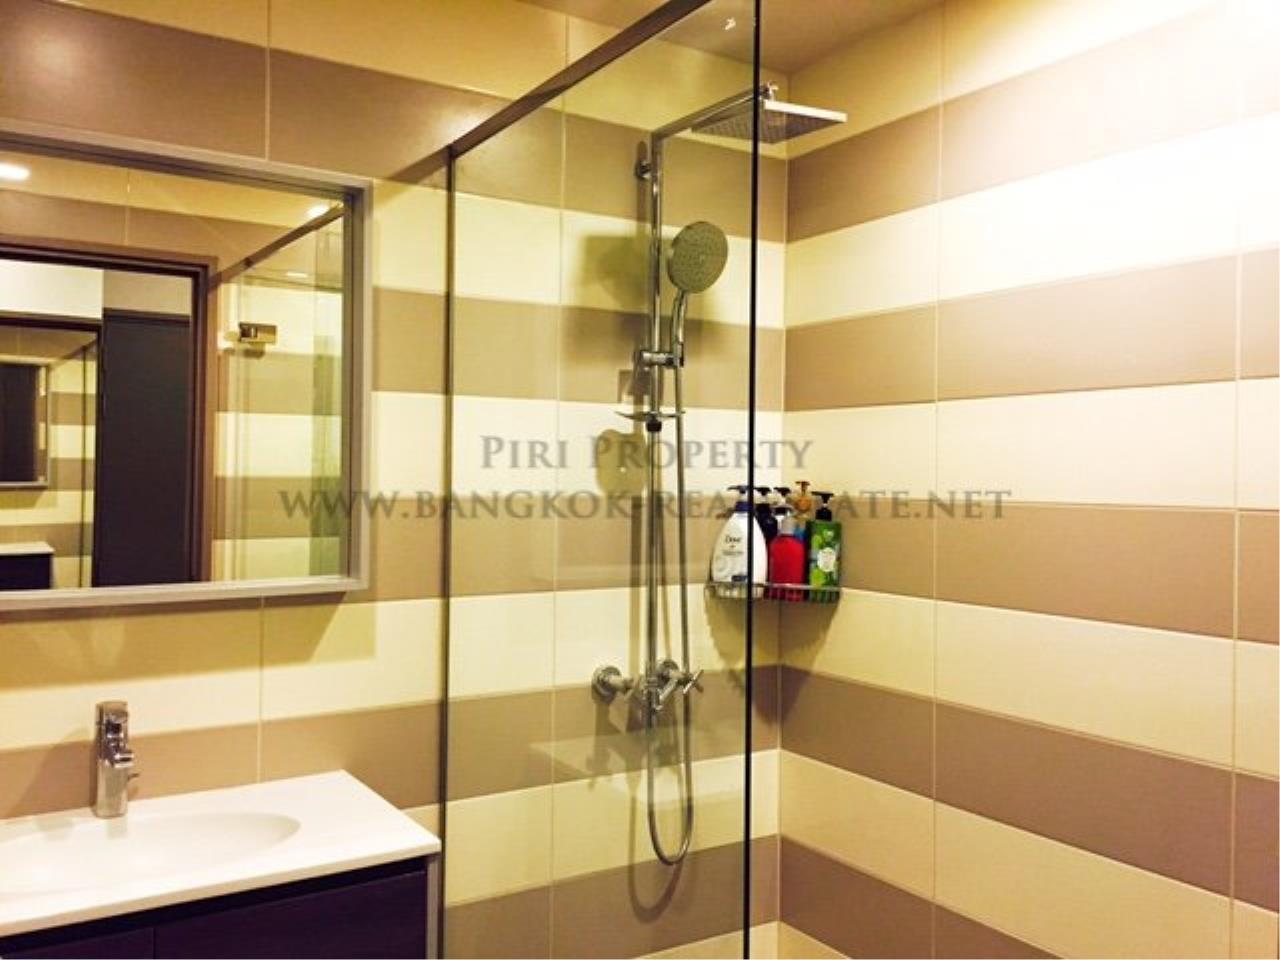 Piri Property Agency's Professionally designed 2bedroom condo in Ekkamai for Rent. 7